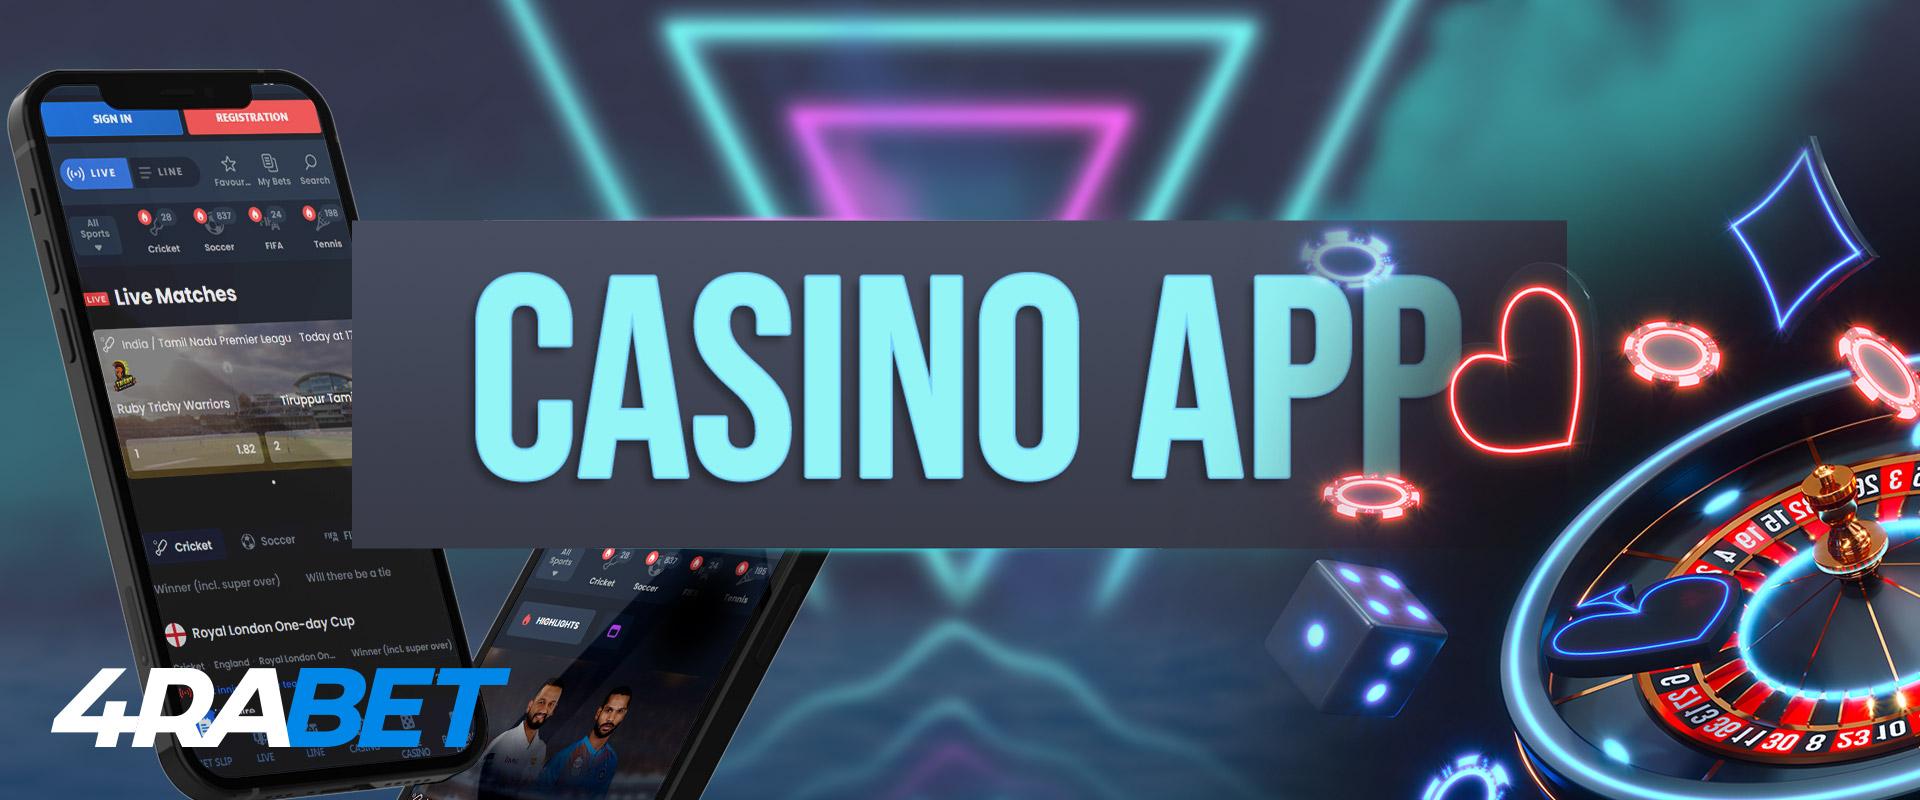 4rabett casino app and mobile interface.